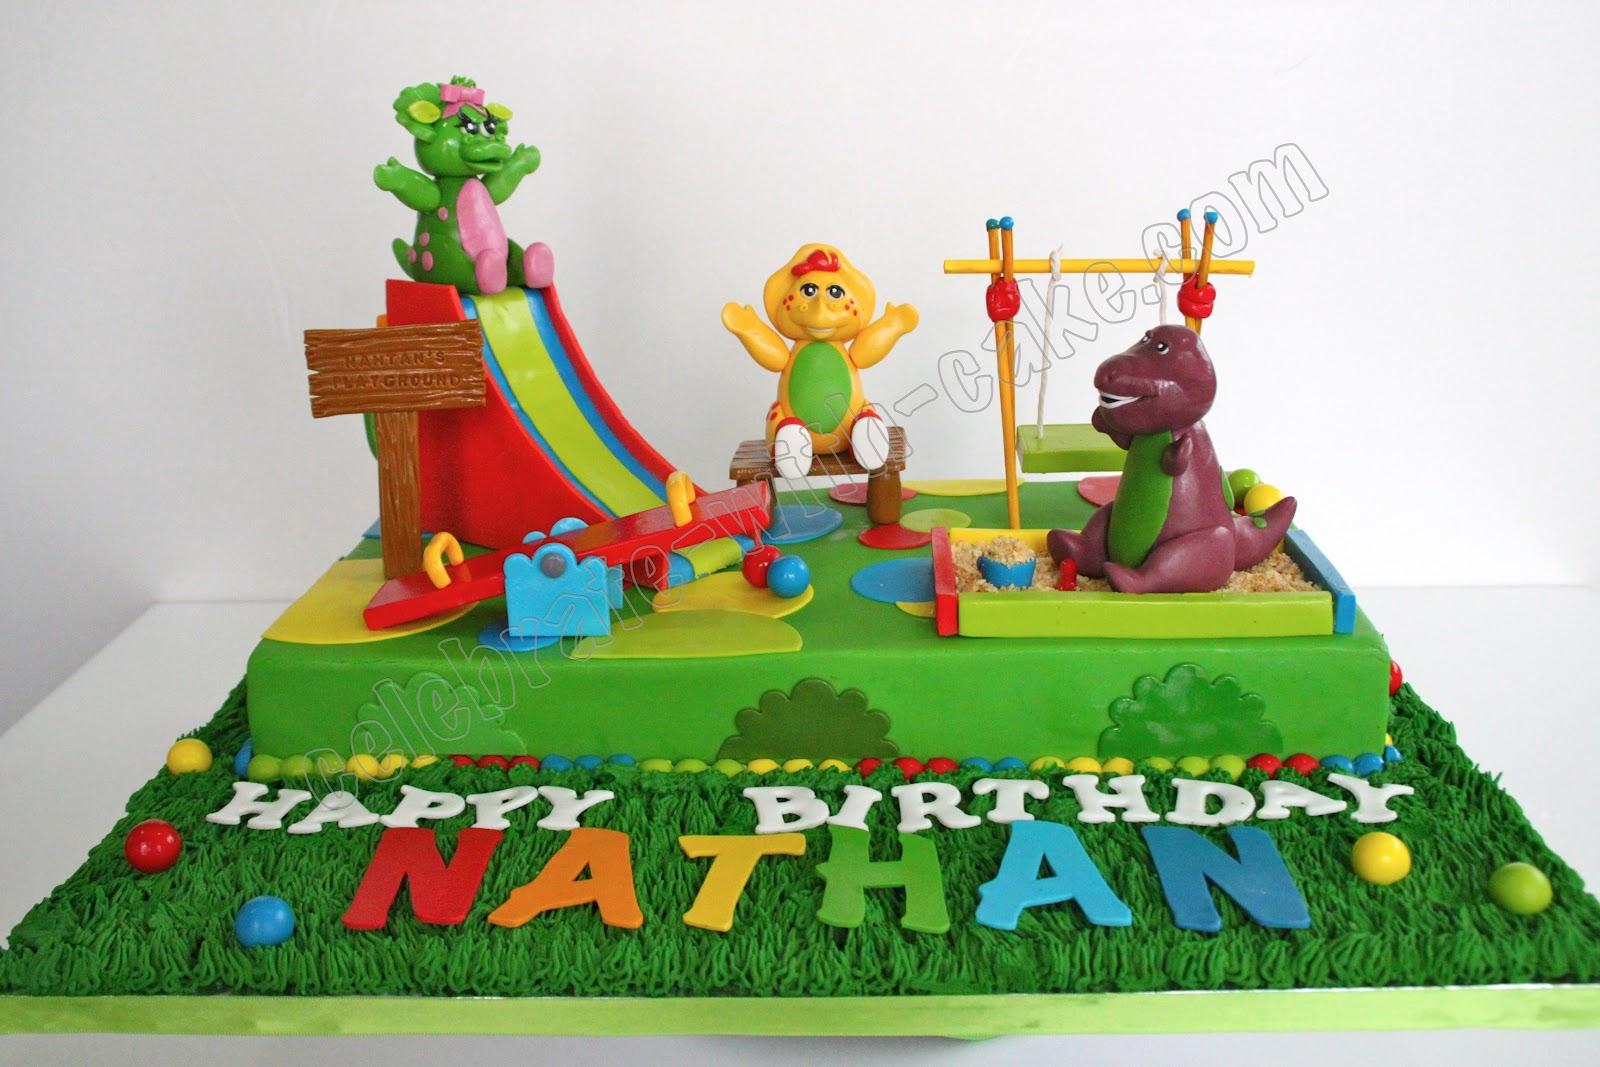 Celebrate With Cake Barney Playground Cake